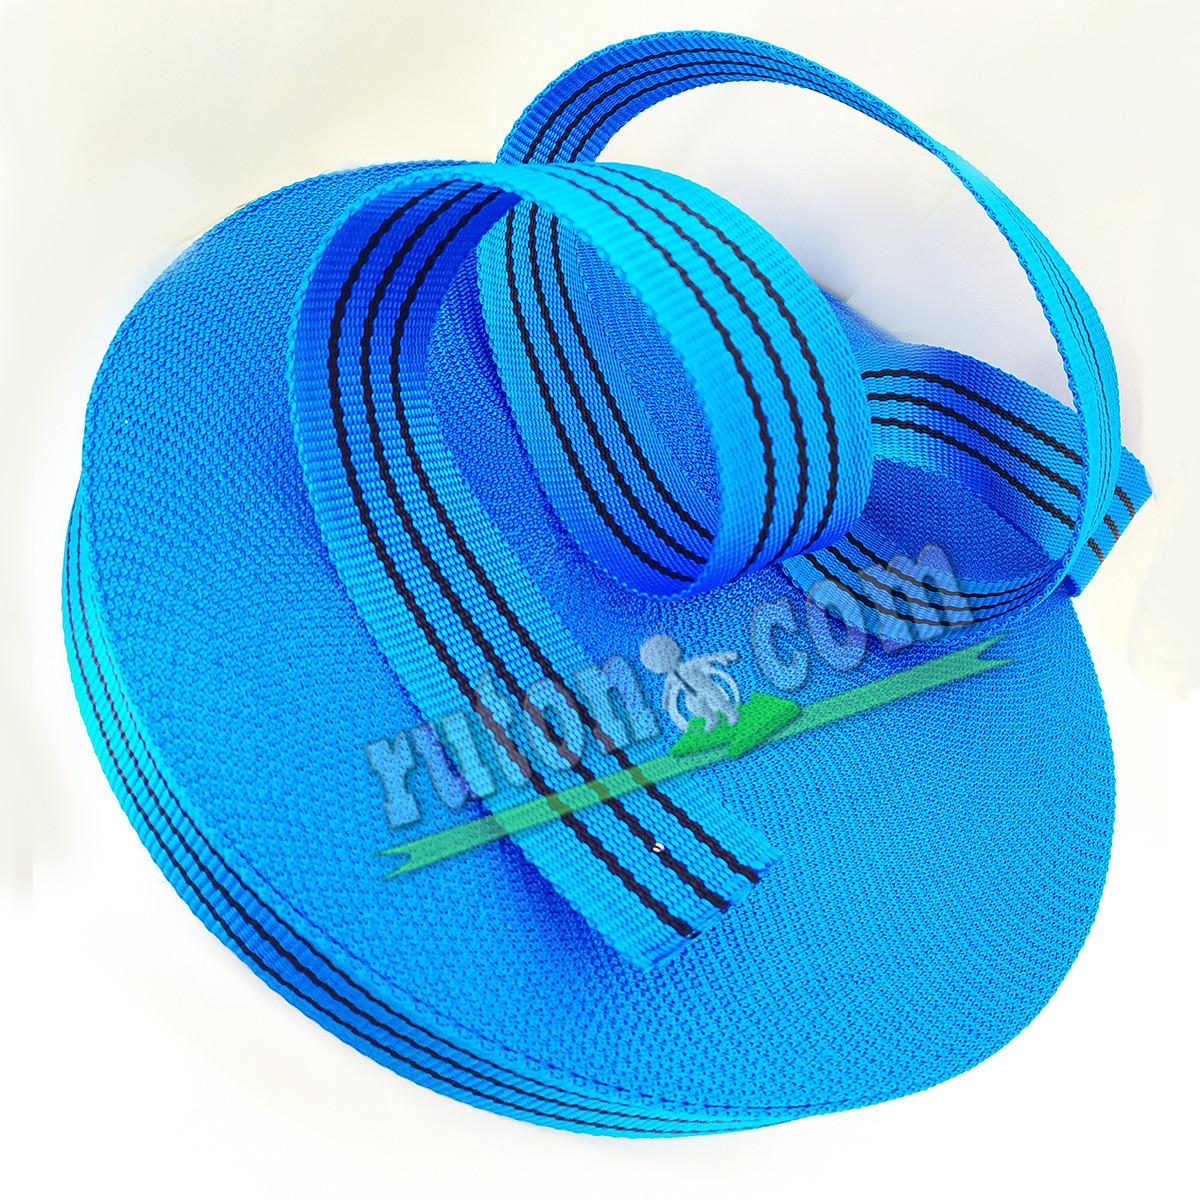 50 мм 50 м на 2 т синя капроновая буксировочная лента для стяжных ремней / тісьма буксирувальна